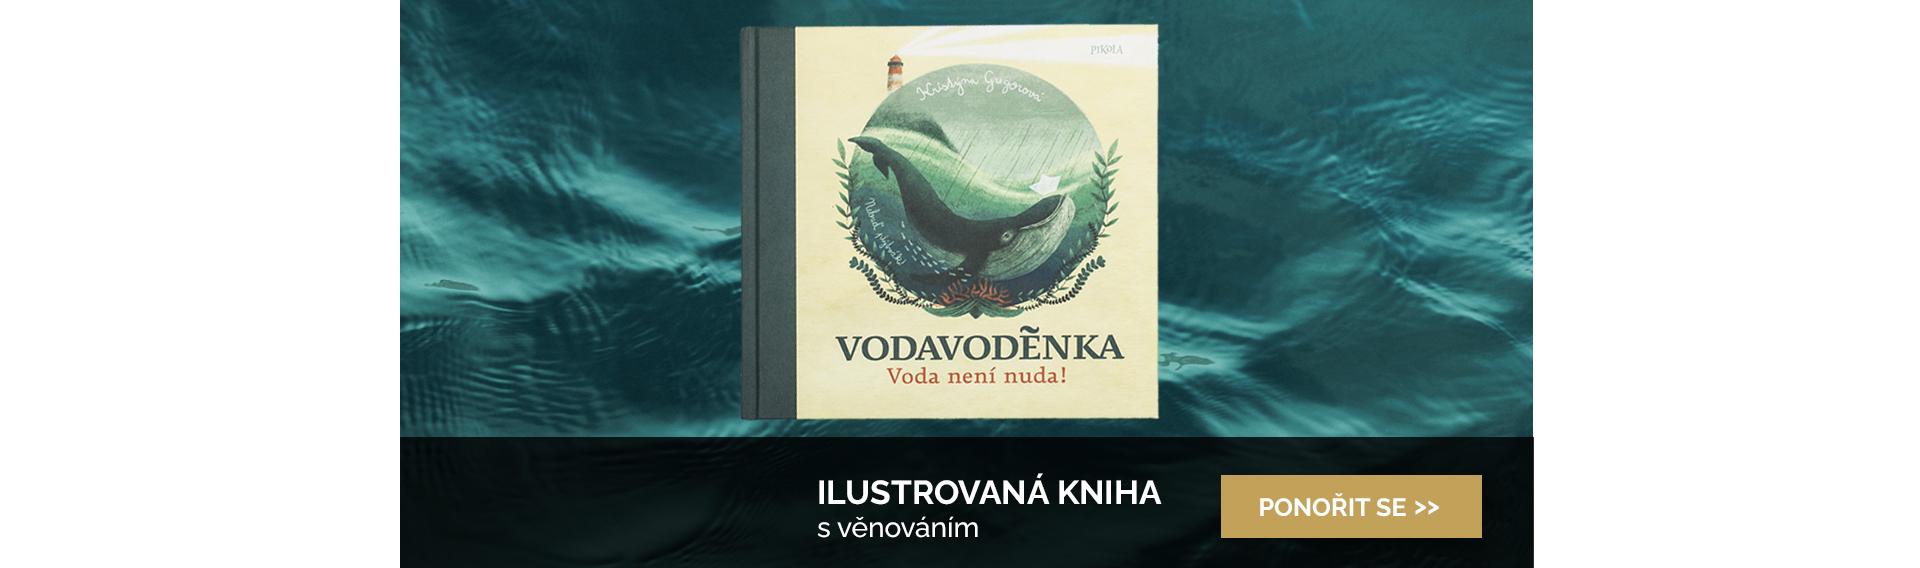 Ilustrovaná kniha Vodavoděnka